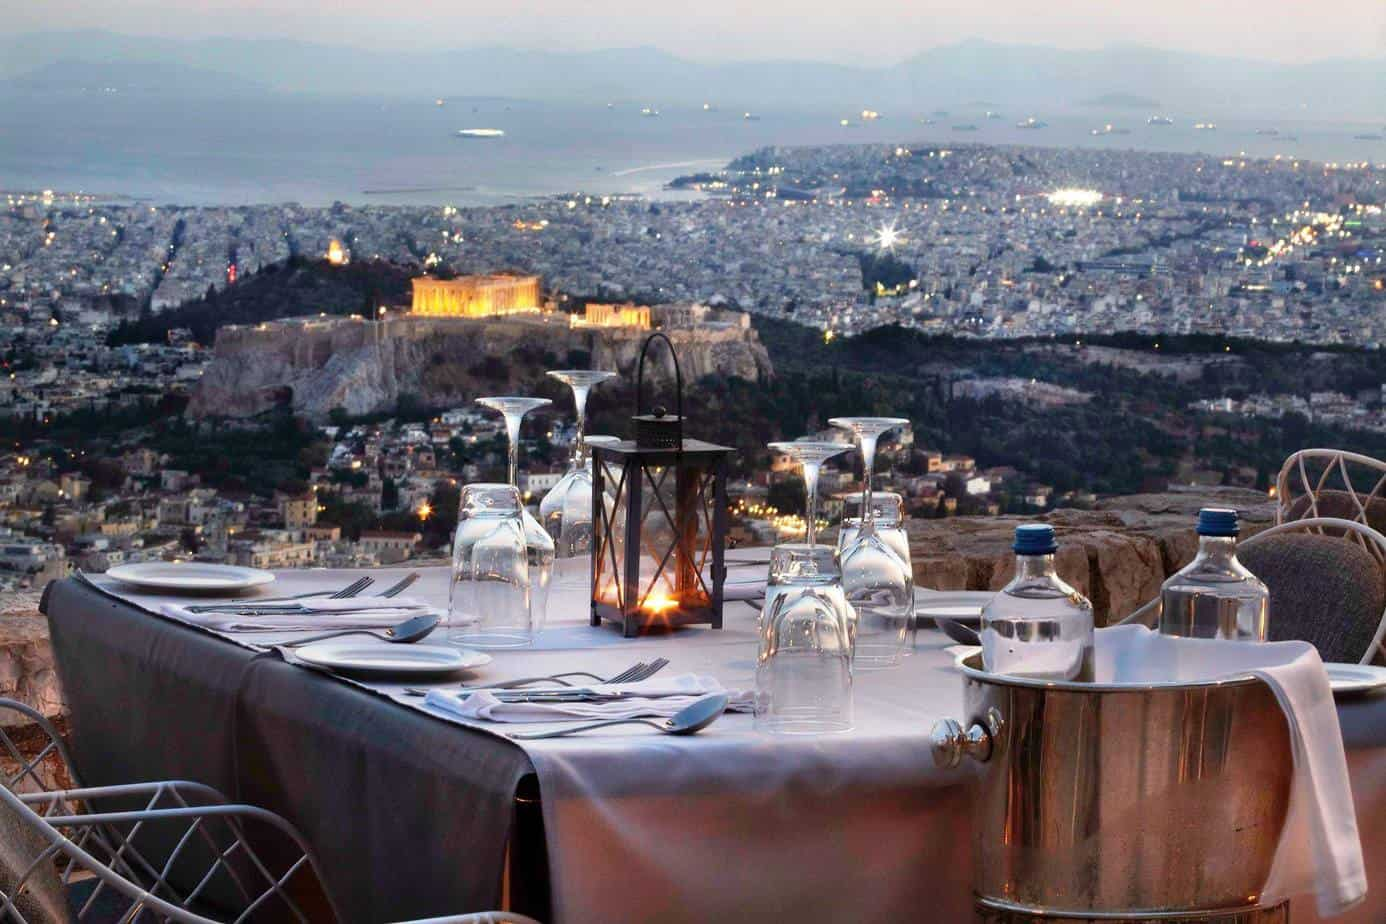 11 OF THE BEST ROOFTOP RESTAURANTS IN ATHENS IN 2021